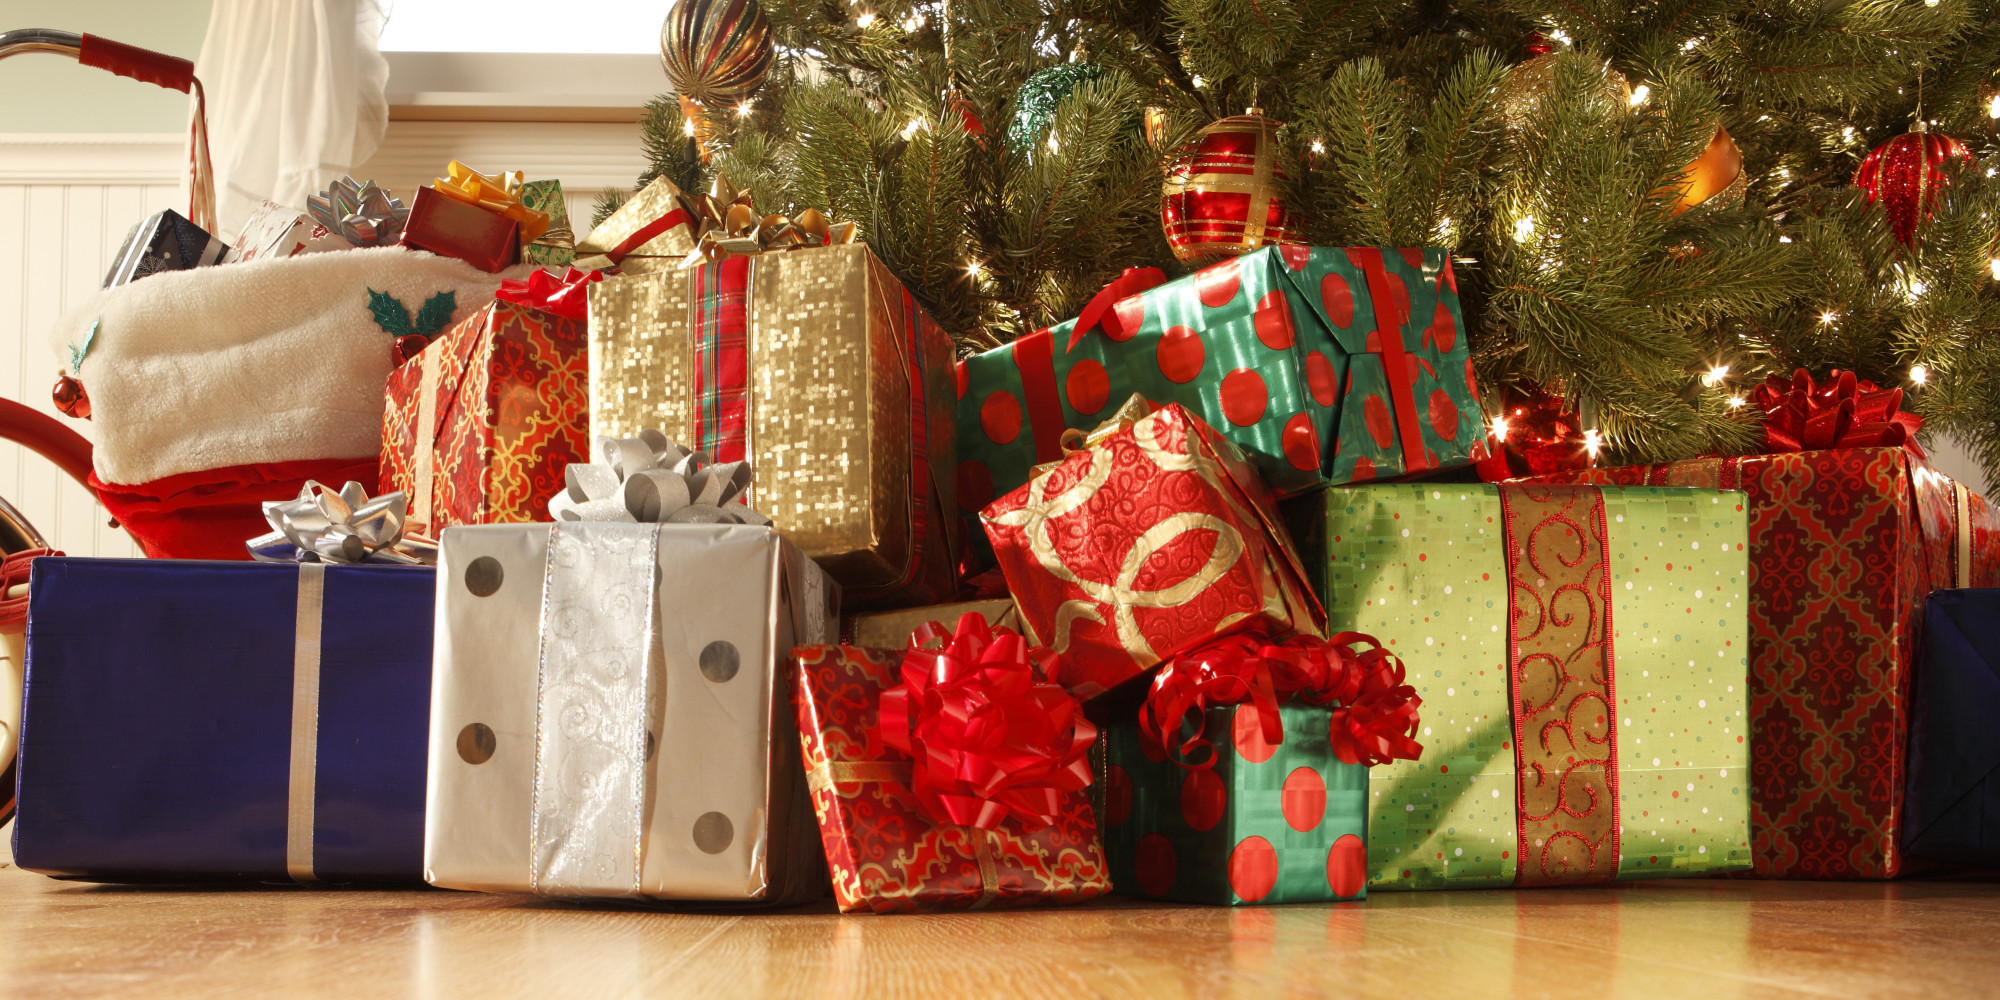 Gift Under Tree - Humboldt Storage & Moving